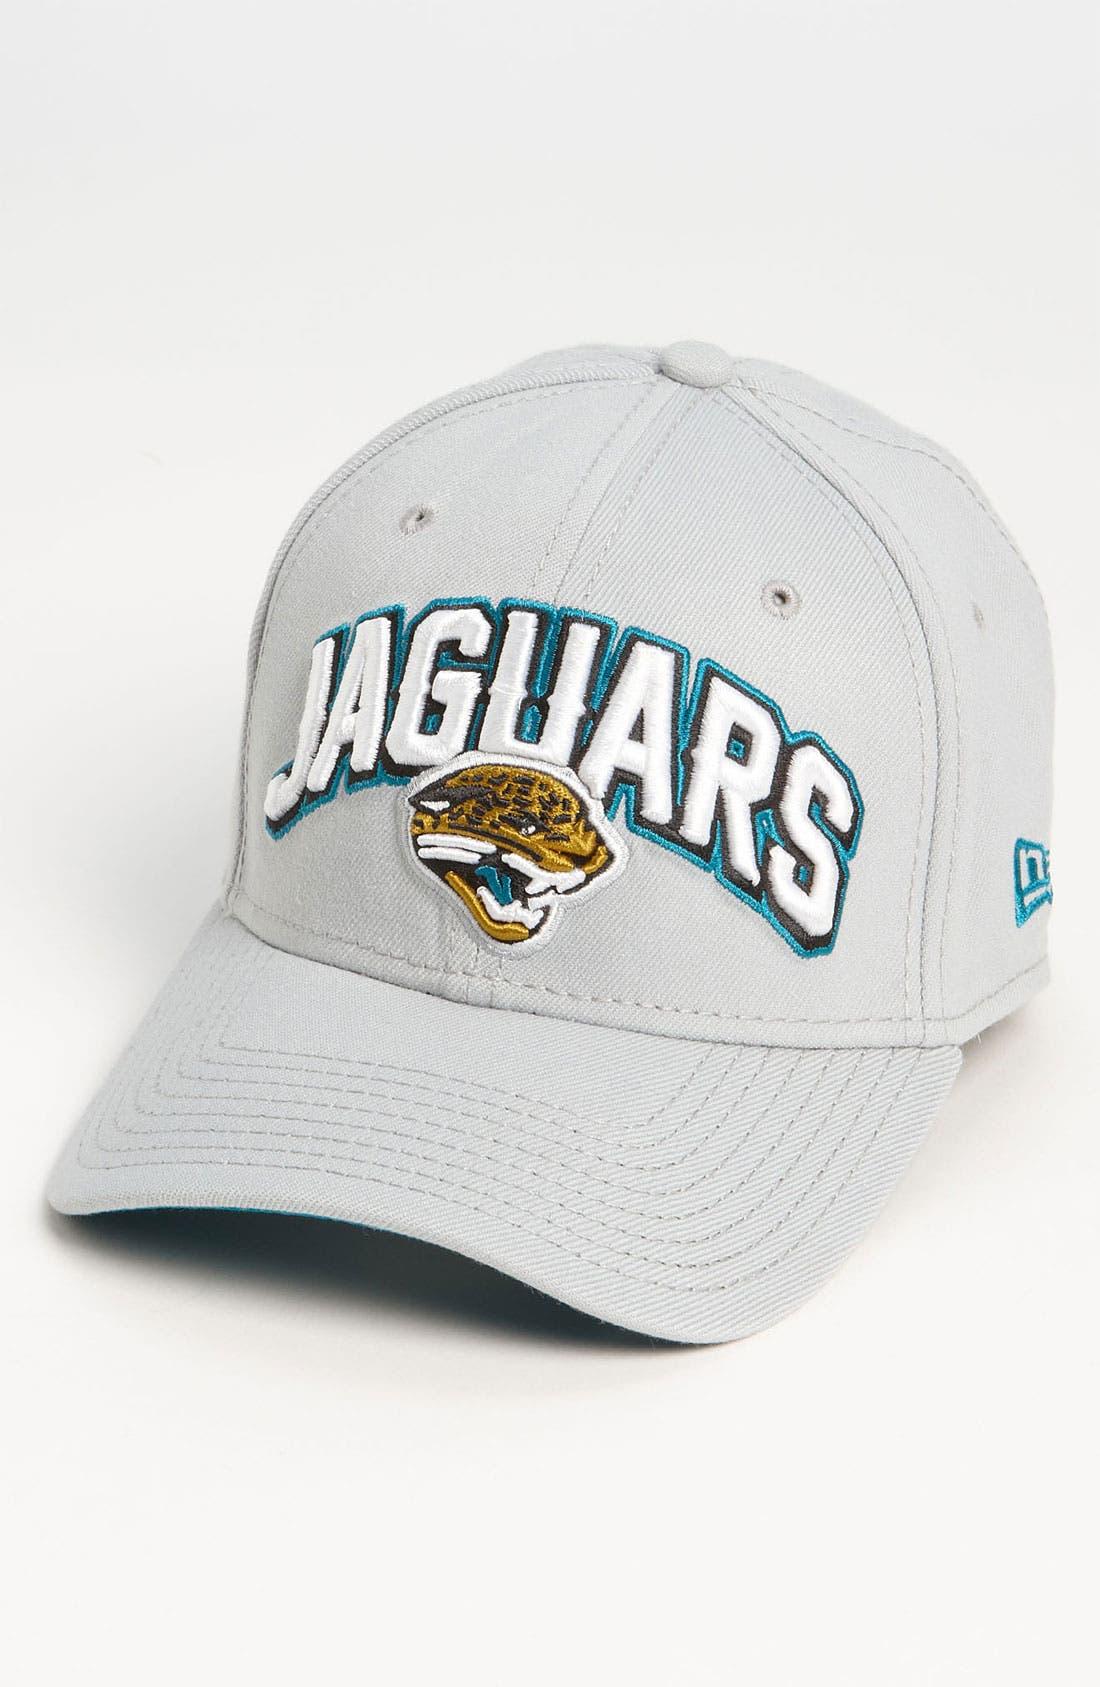 Alternate Image 1 Selected - New Era Cap 'NFL Draft - Jacksonville Jaguars' Baseball Cap